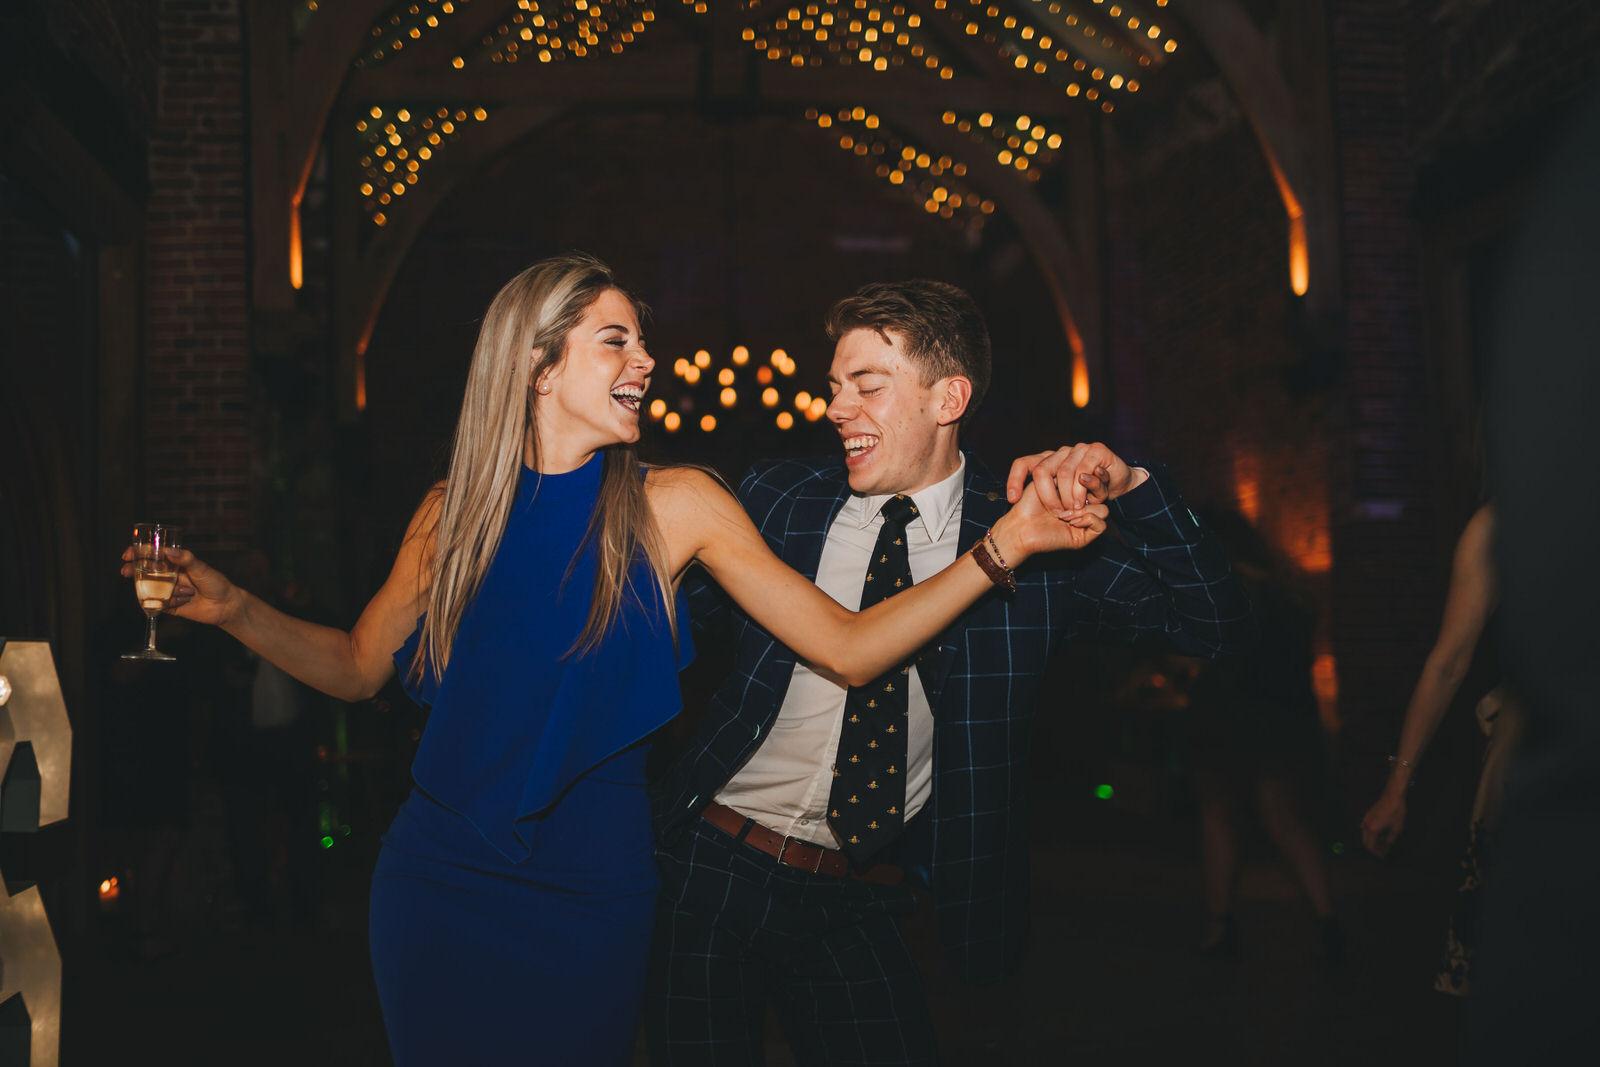 Hazel Gap Barn - Livie Edwards Photography - 13.4.19 - Amy & Ryan -605hazel+gap+nottinghamshire+wedding+venue.jpg